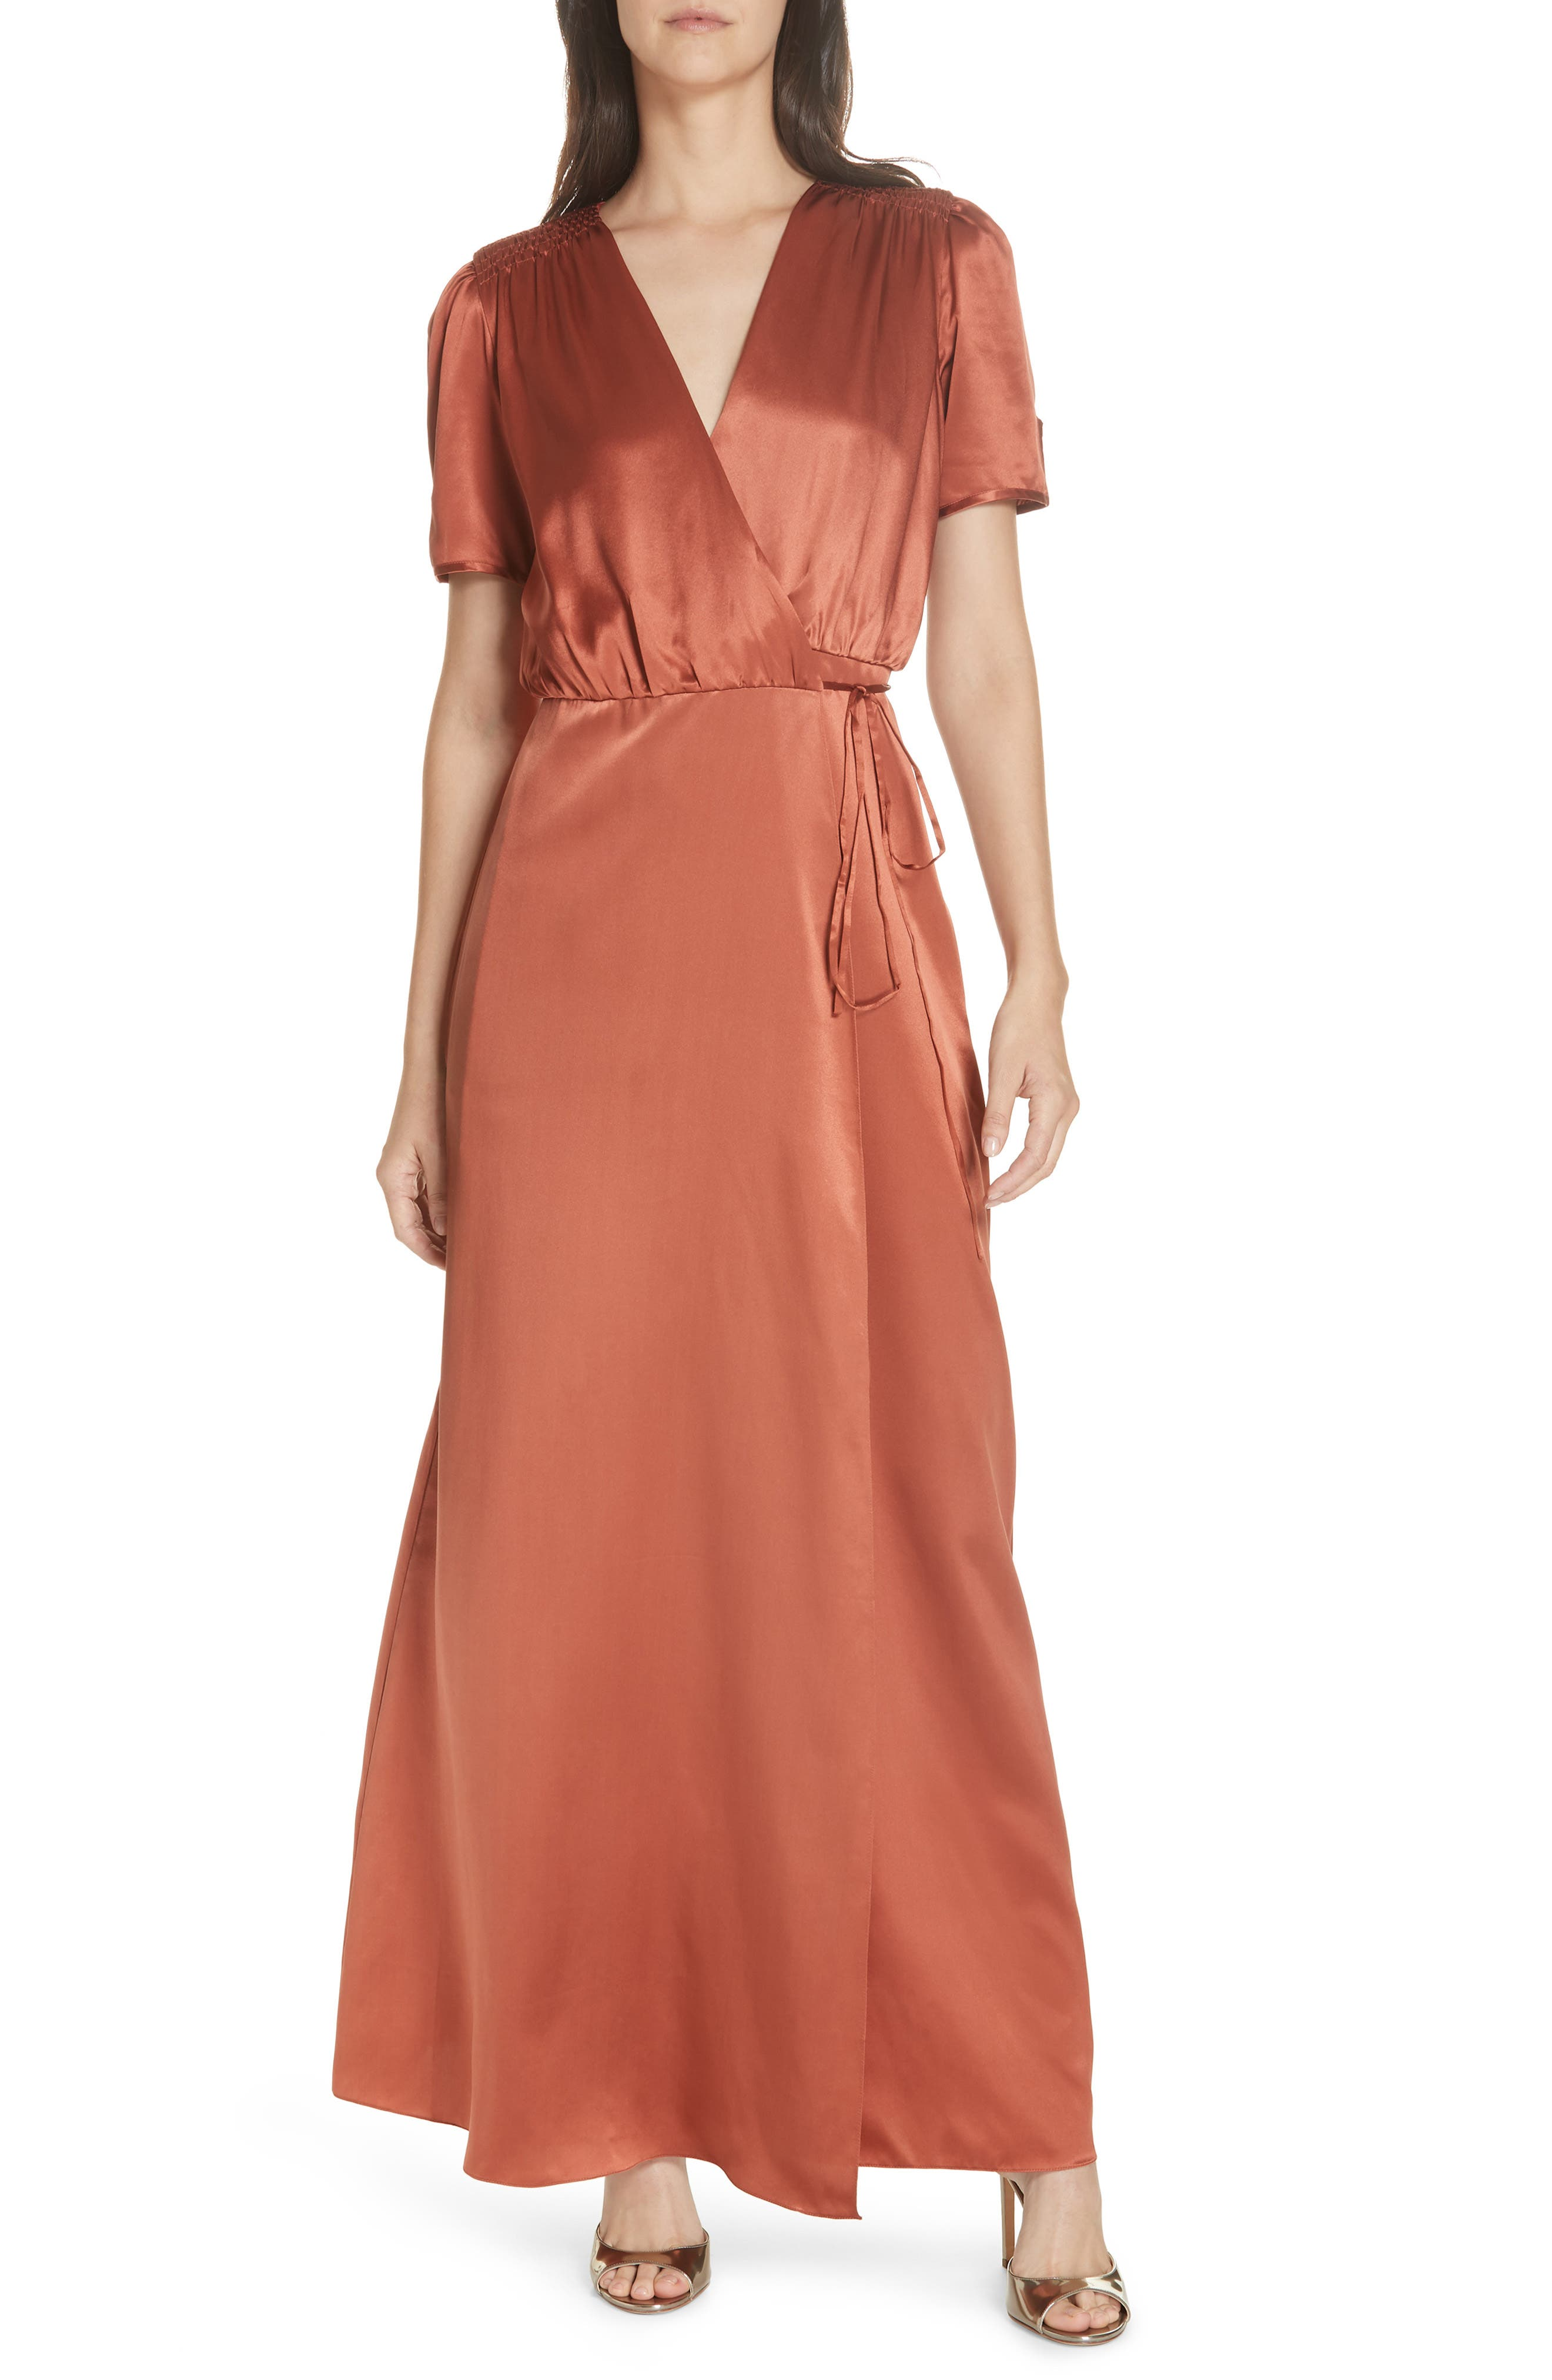 SALONI, Lea Silk Wrap Dress, Main thumbnail 1, color, DEEP RUSH